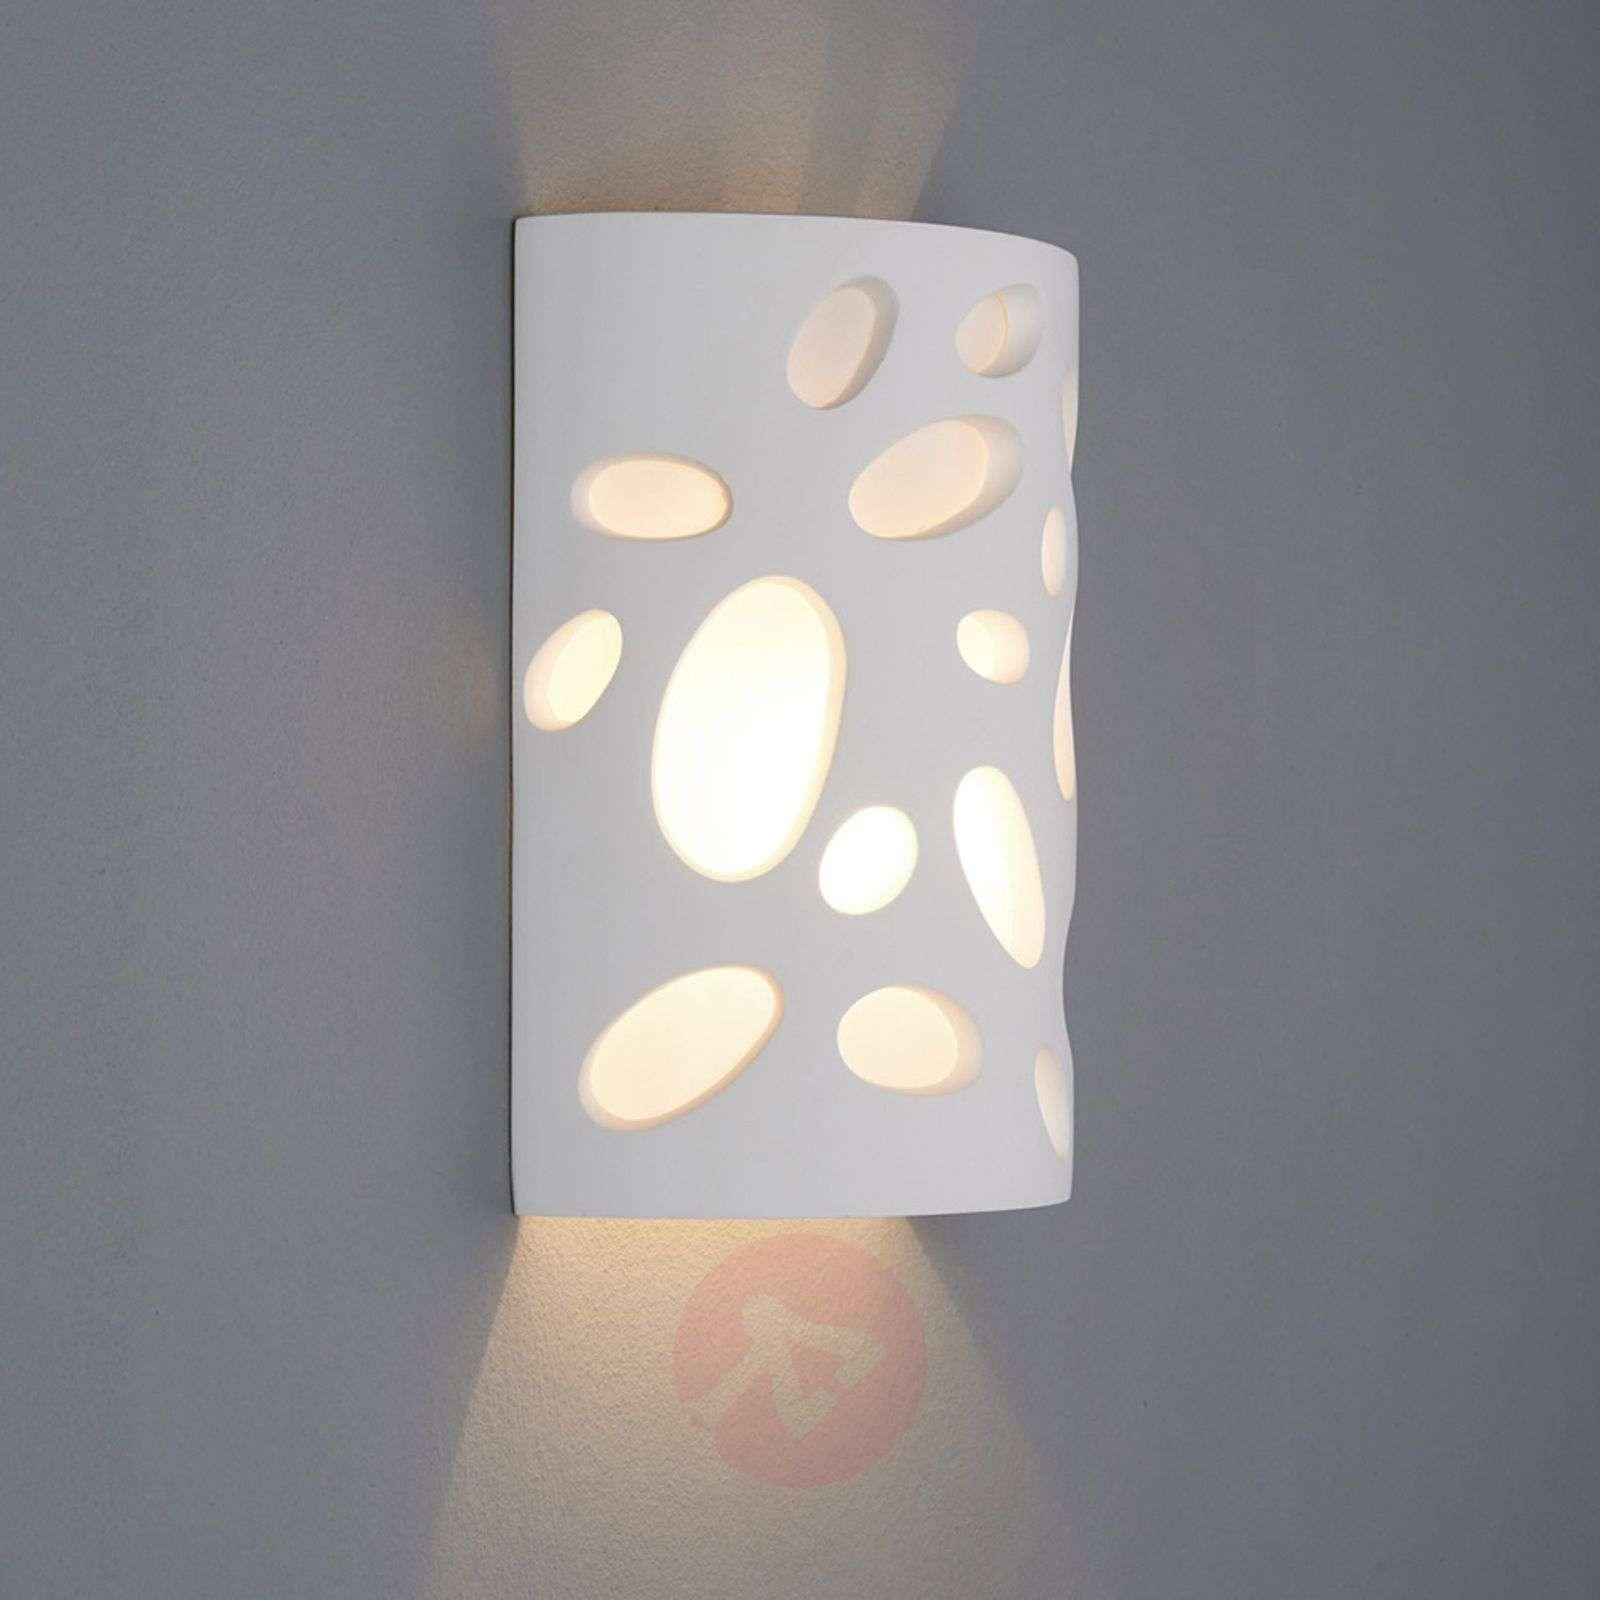 Hanni Wall Light Decorative Plaster-9613026-01